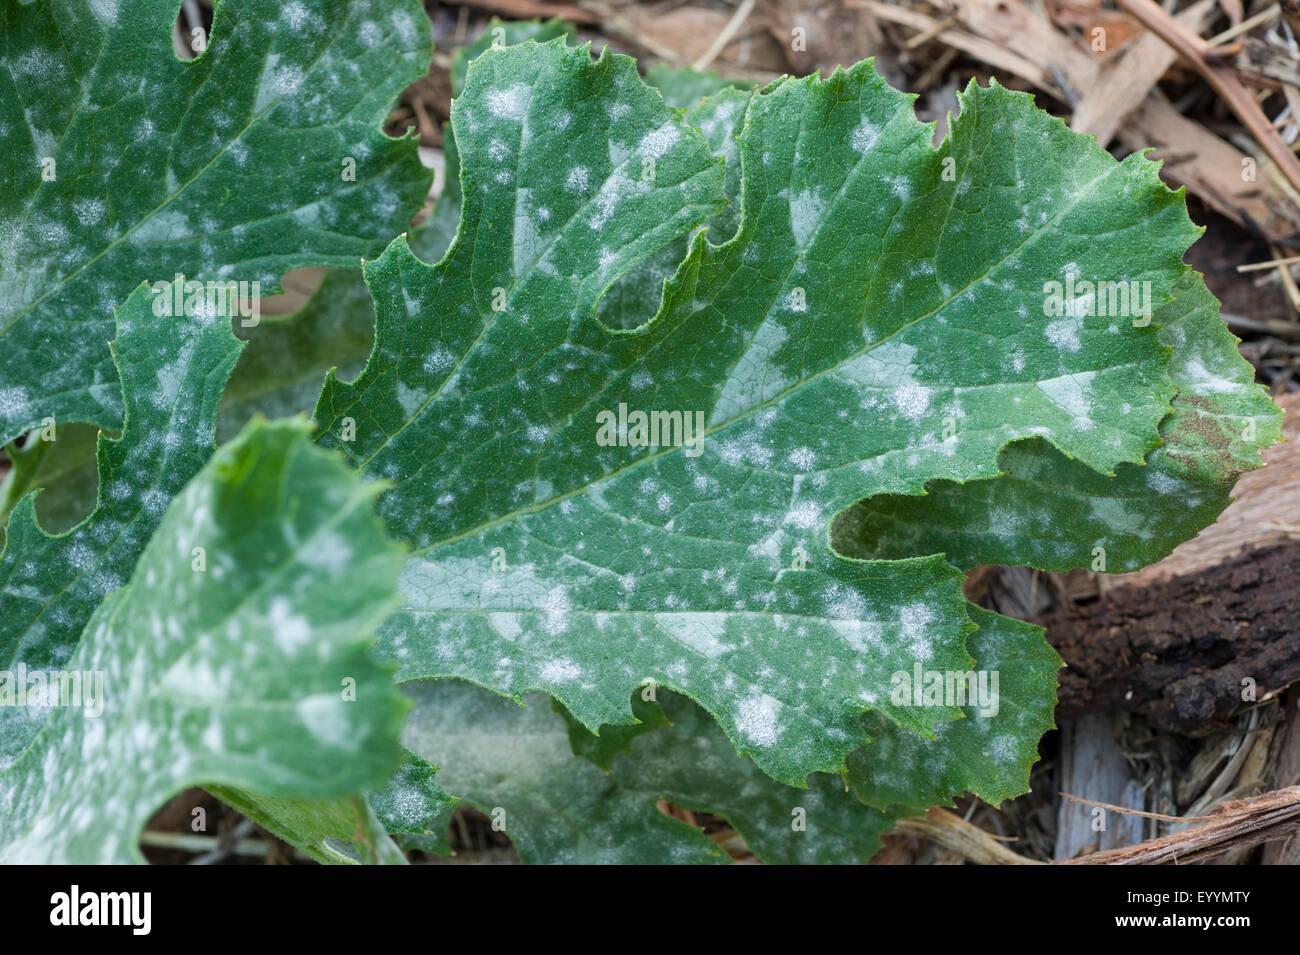 Powdery mildew on zucchini leaves - Stock Image